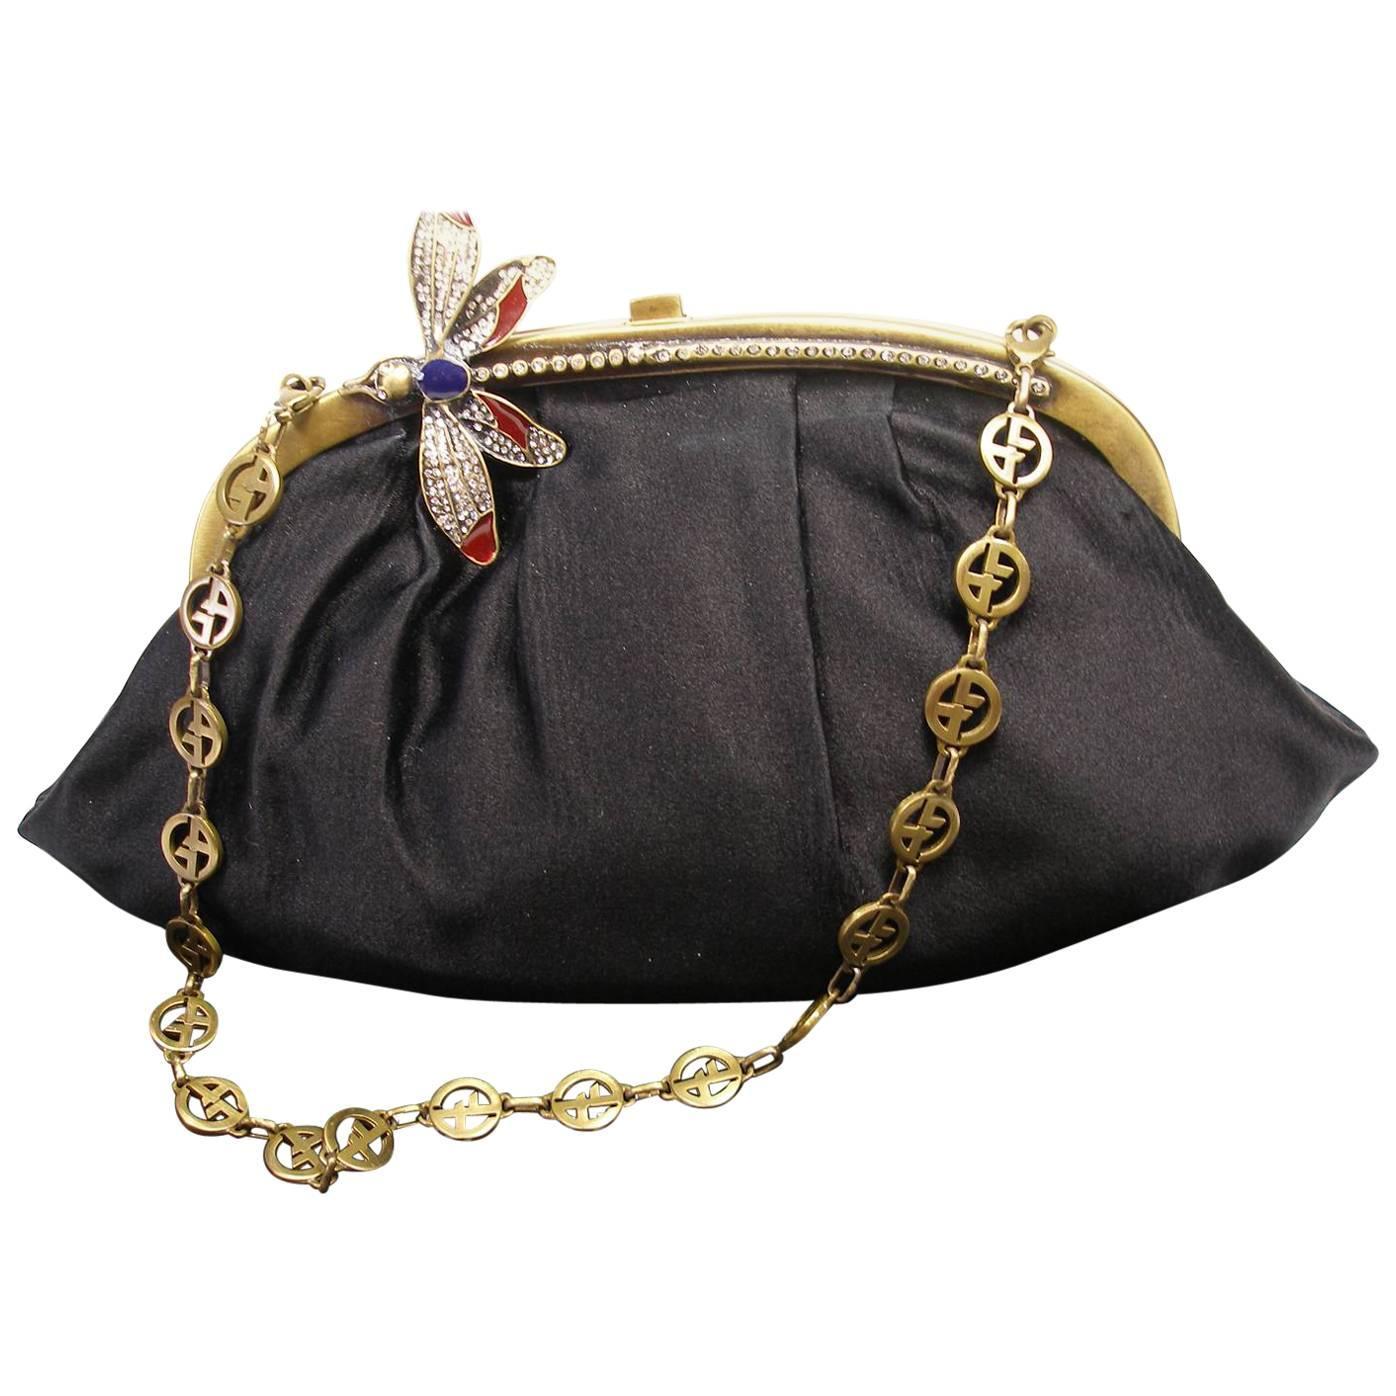 1stdibs Armani Vintage Evening Small Handbag Or Clutch Black Satin And Strass Butterfly BTgrm